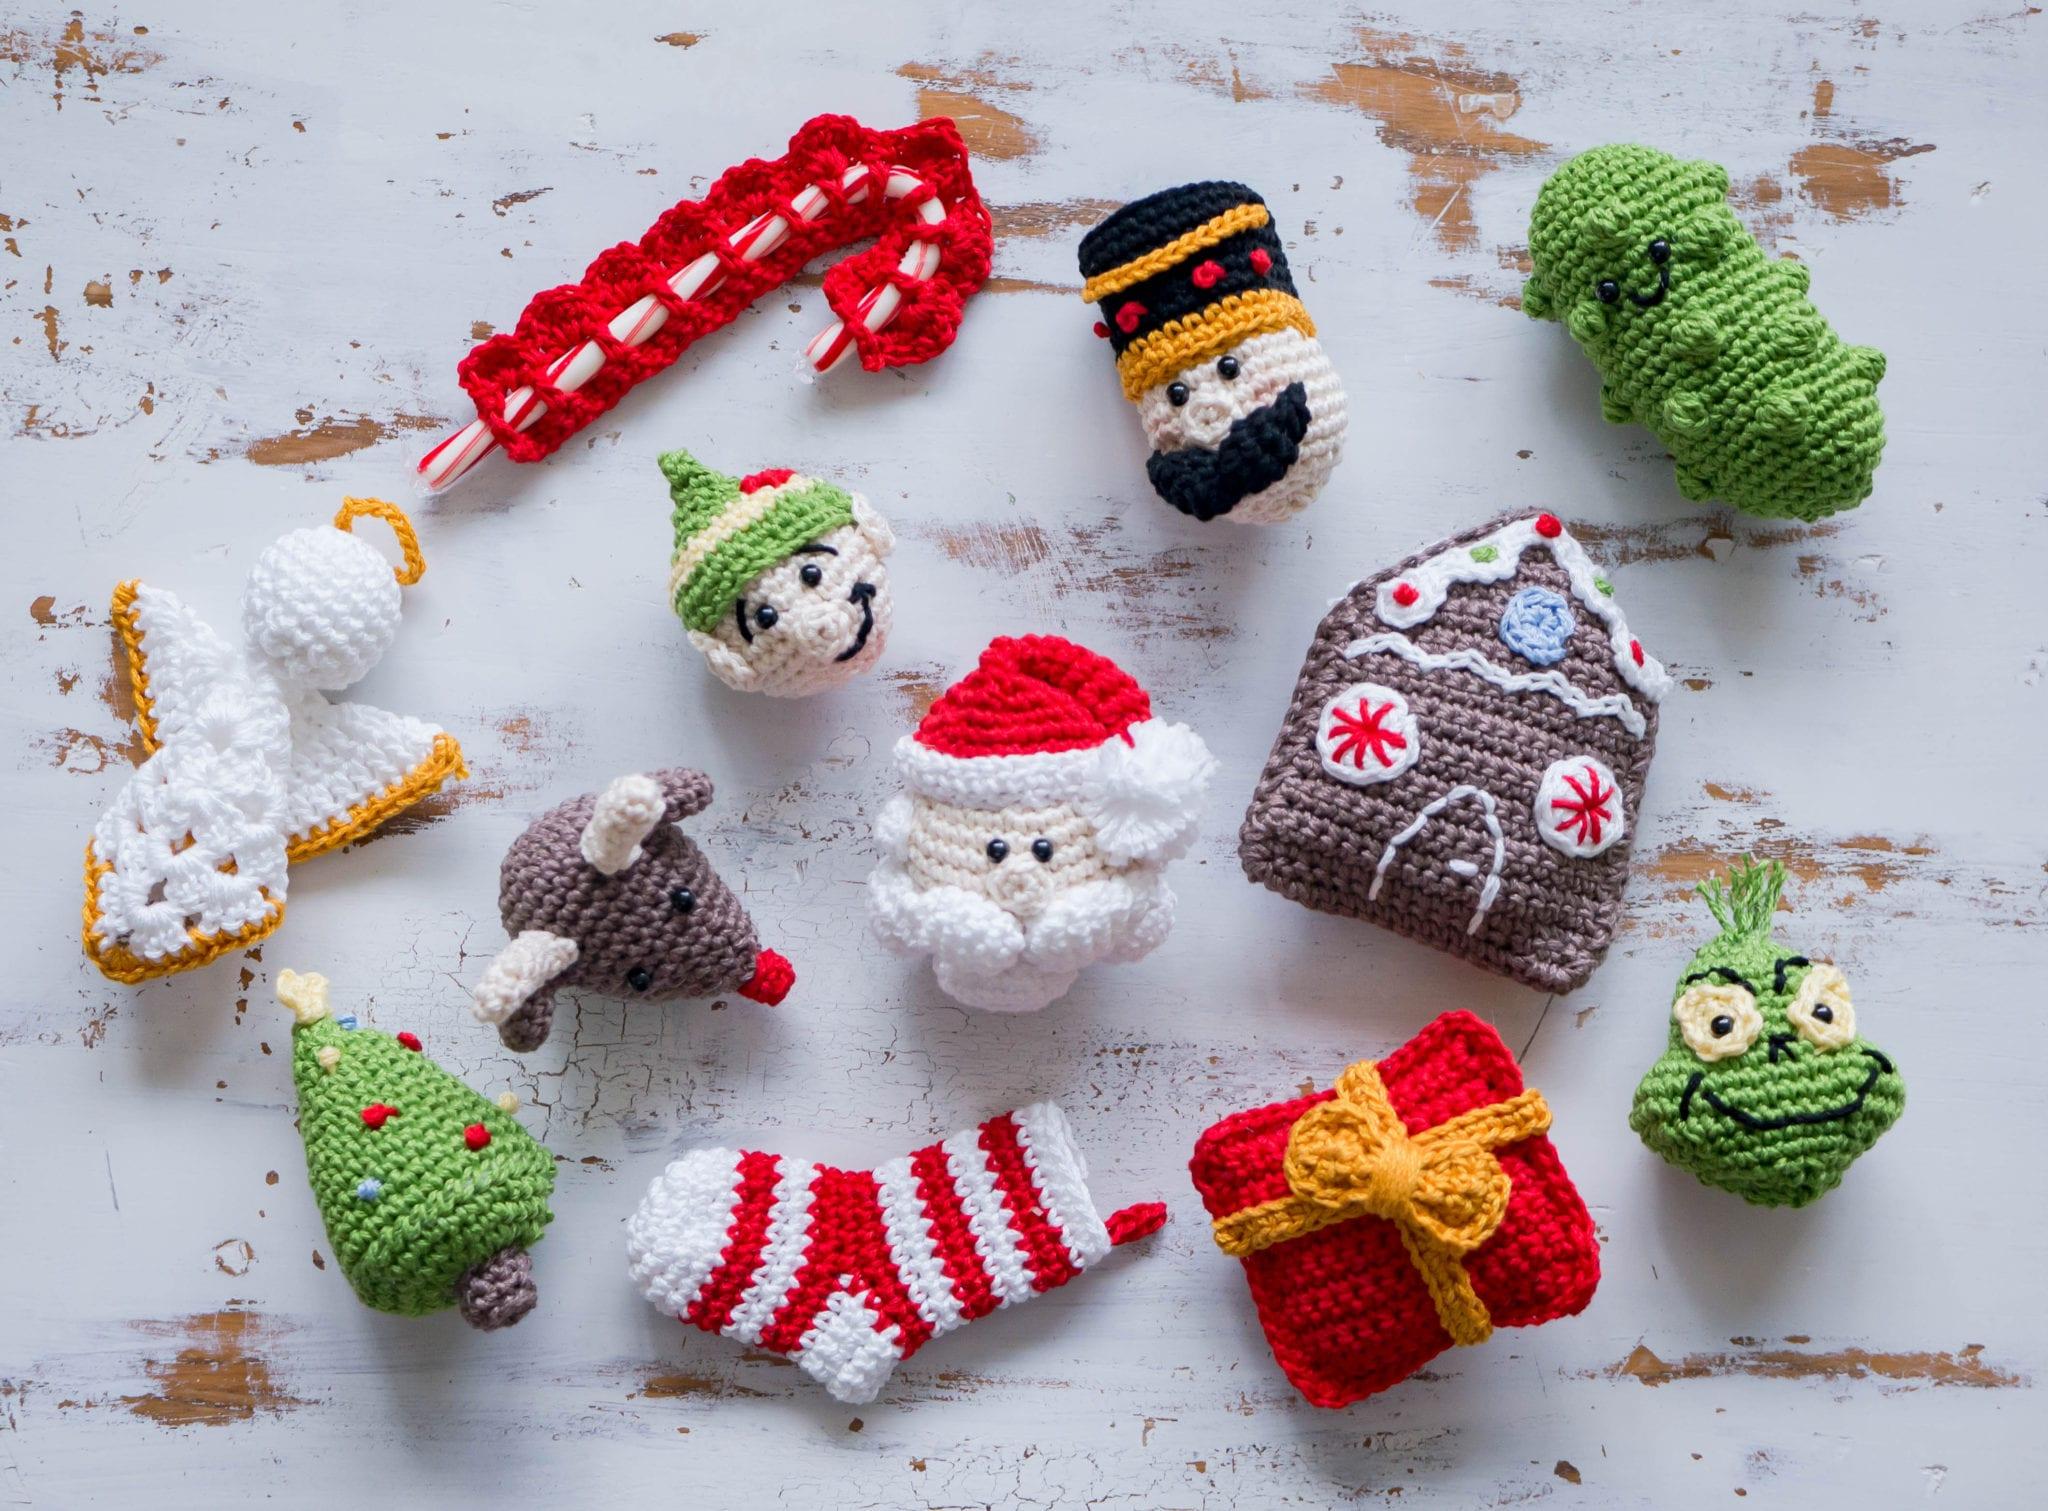 Crochet Present Christmas Ornament - Sewrella